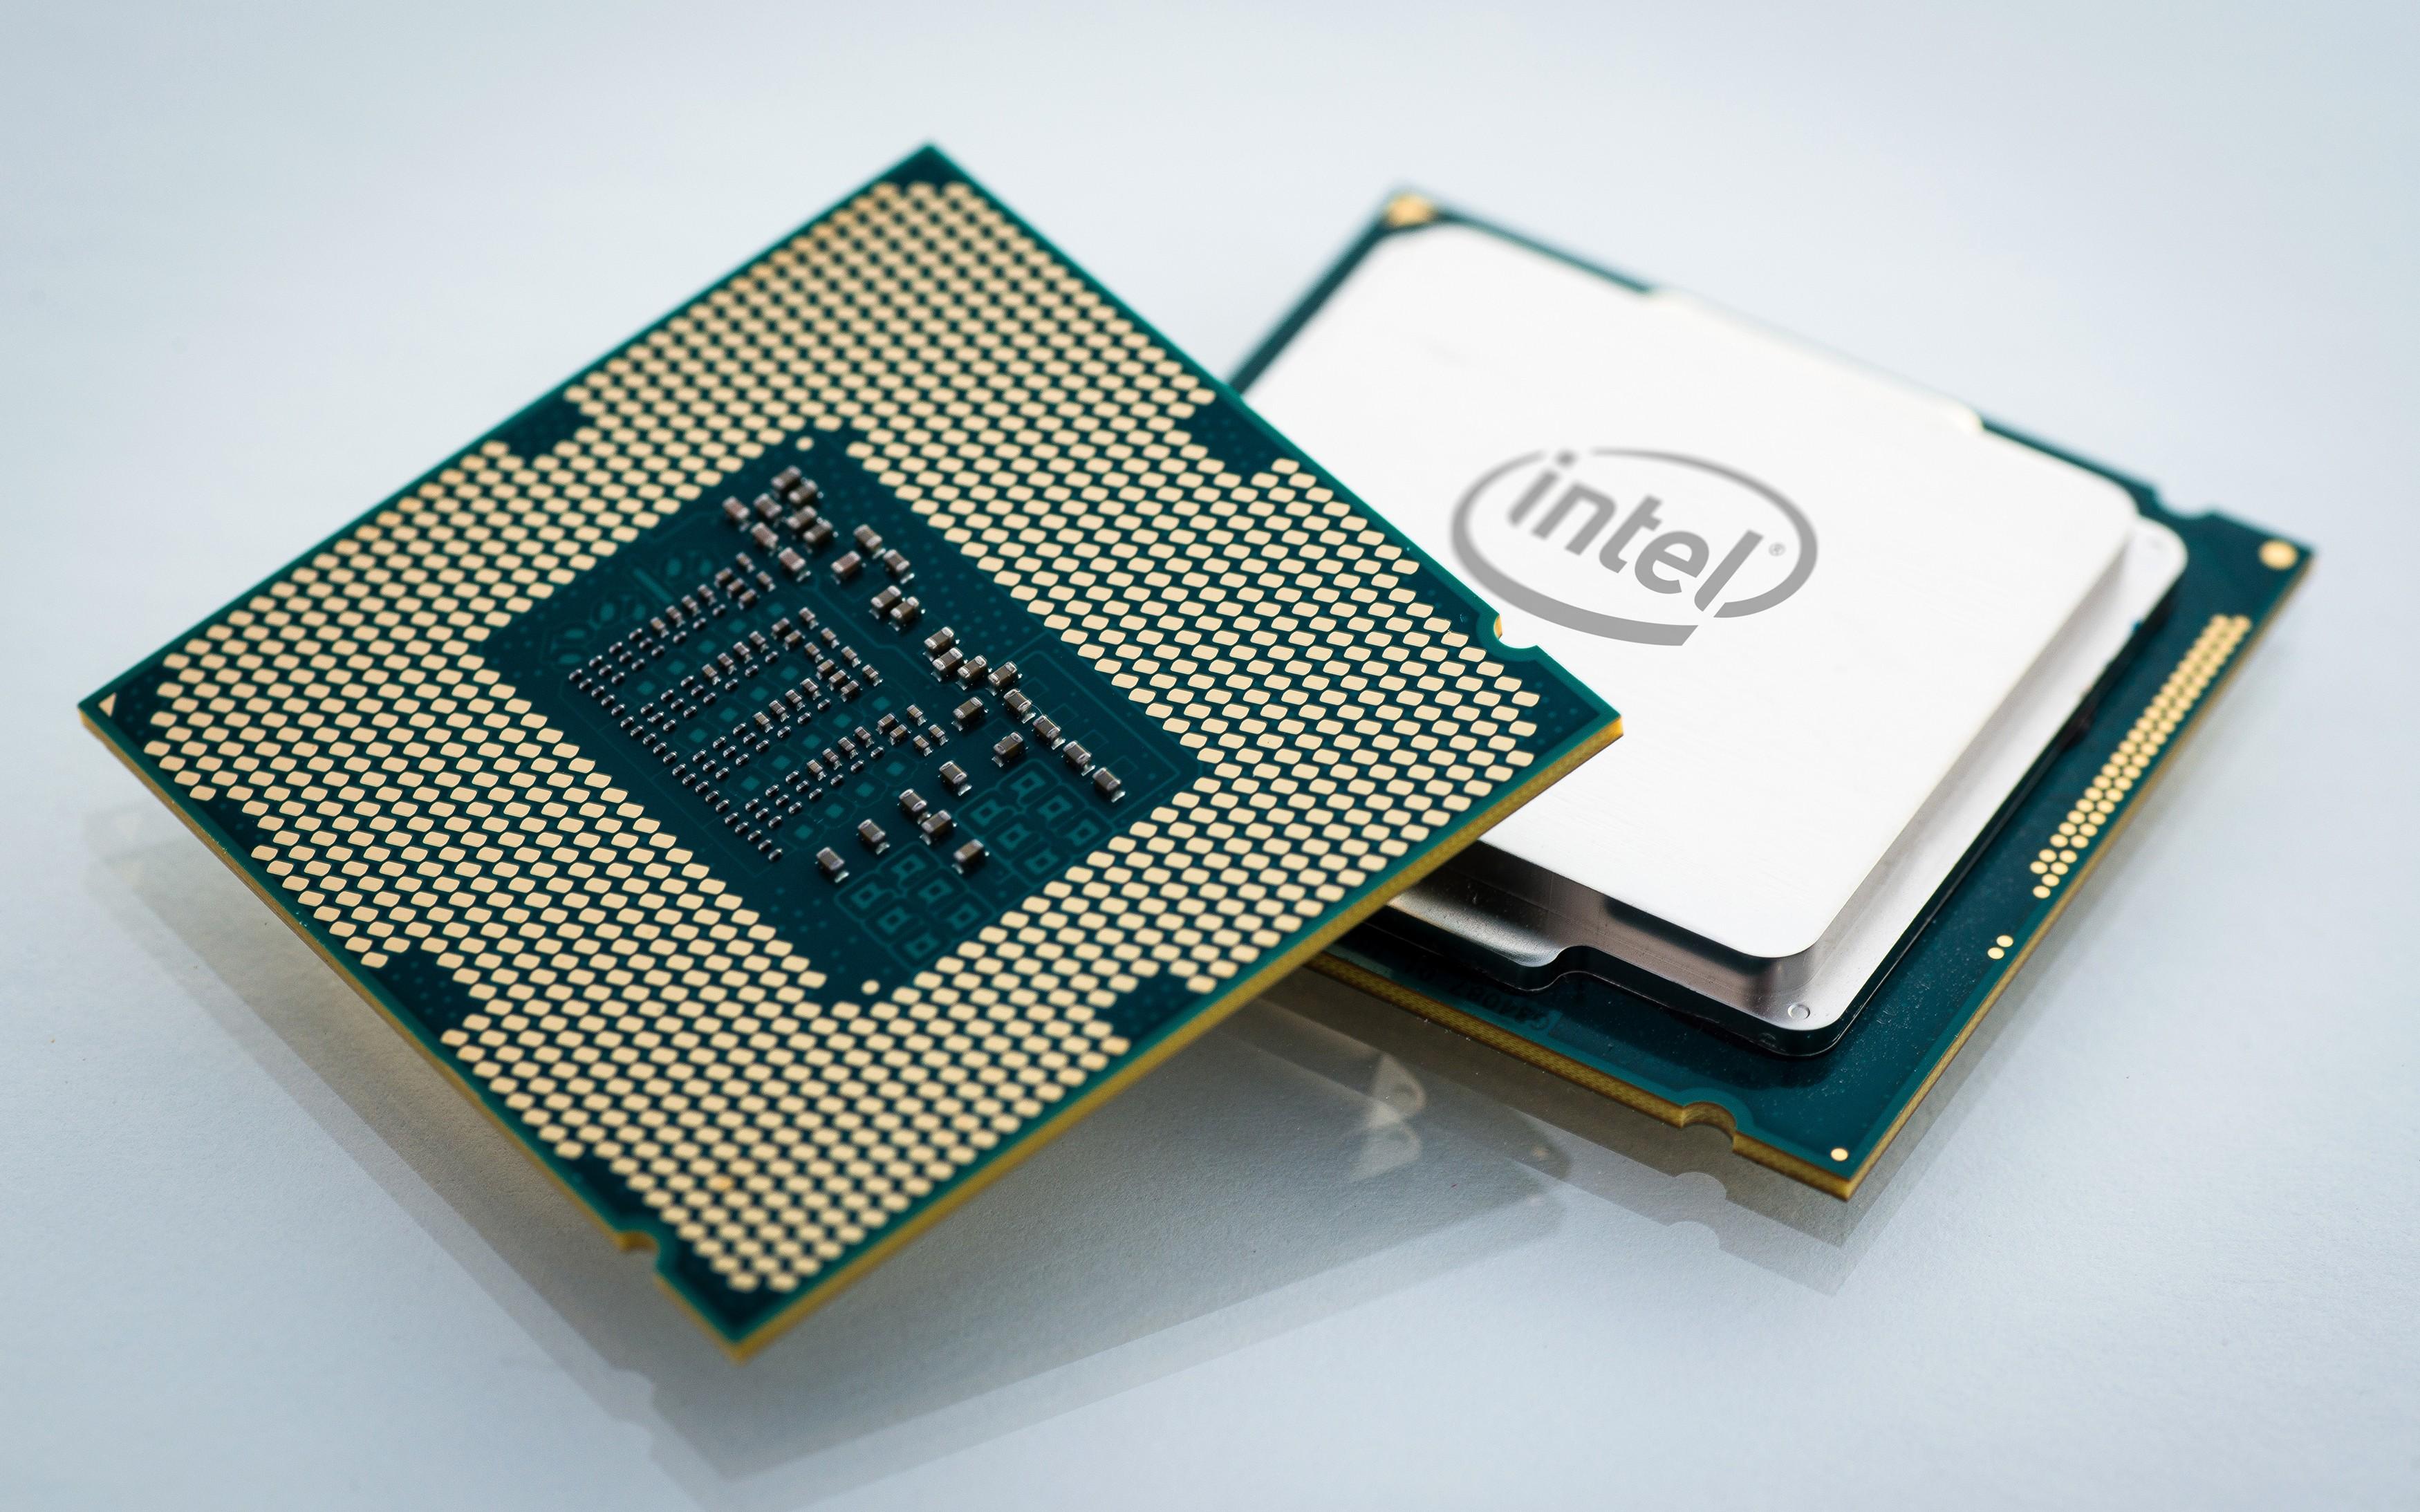 General 3500x2187 CPU computer Intel